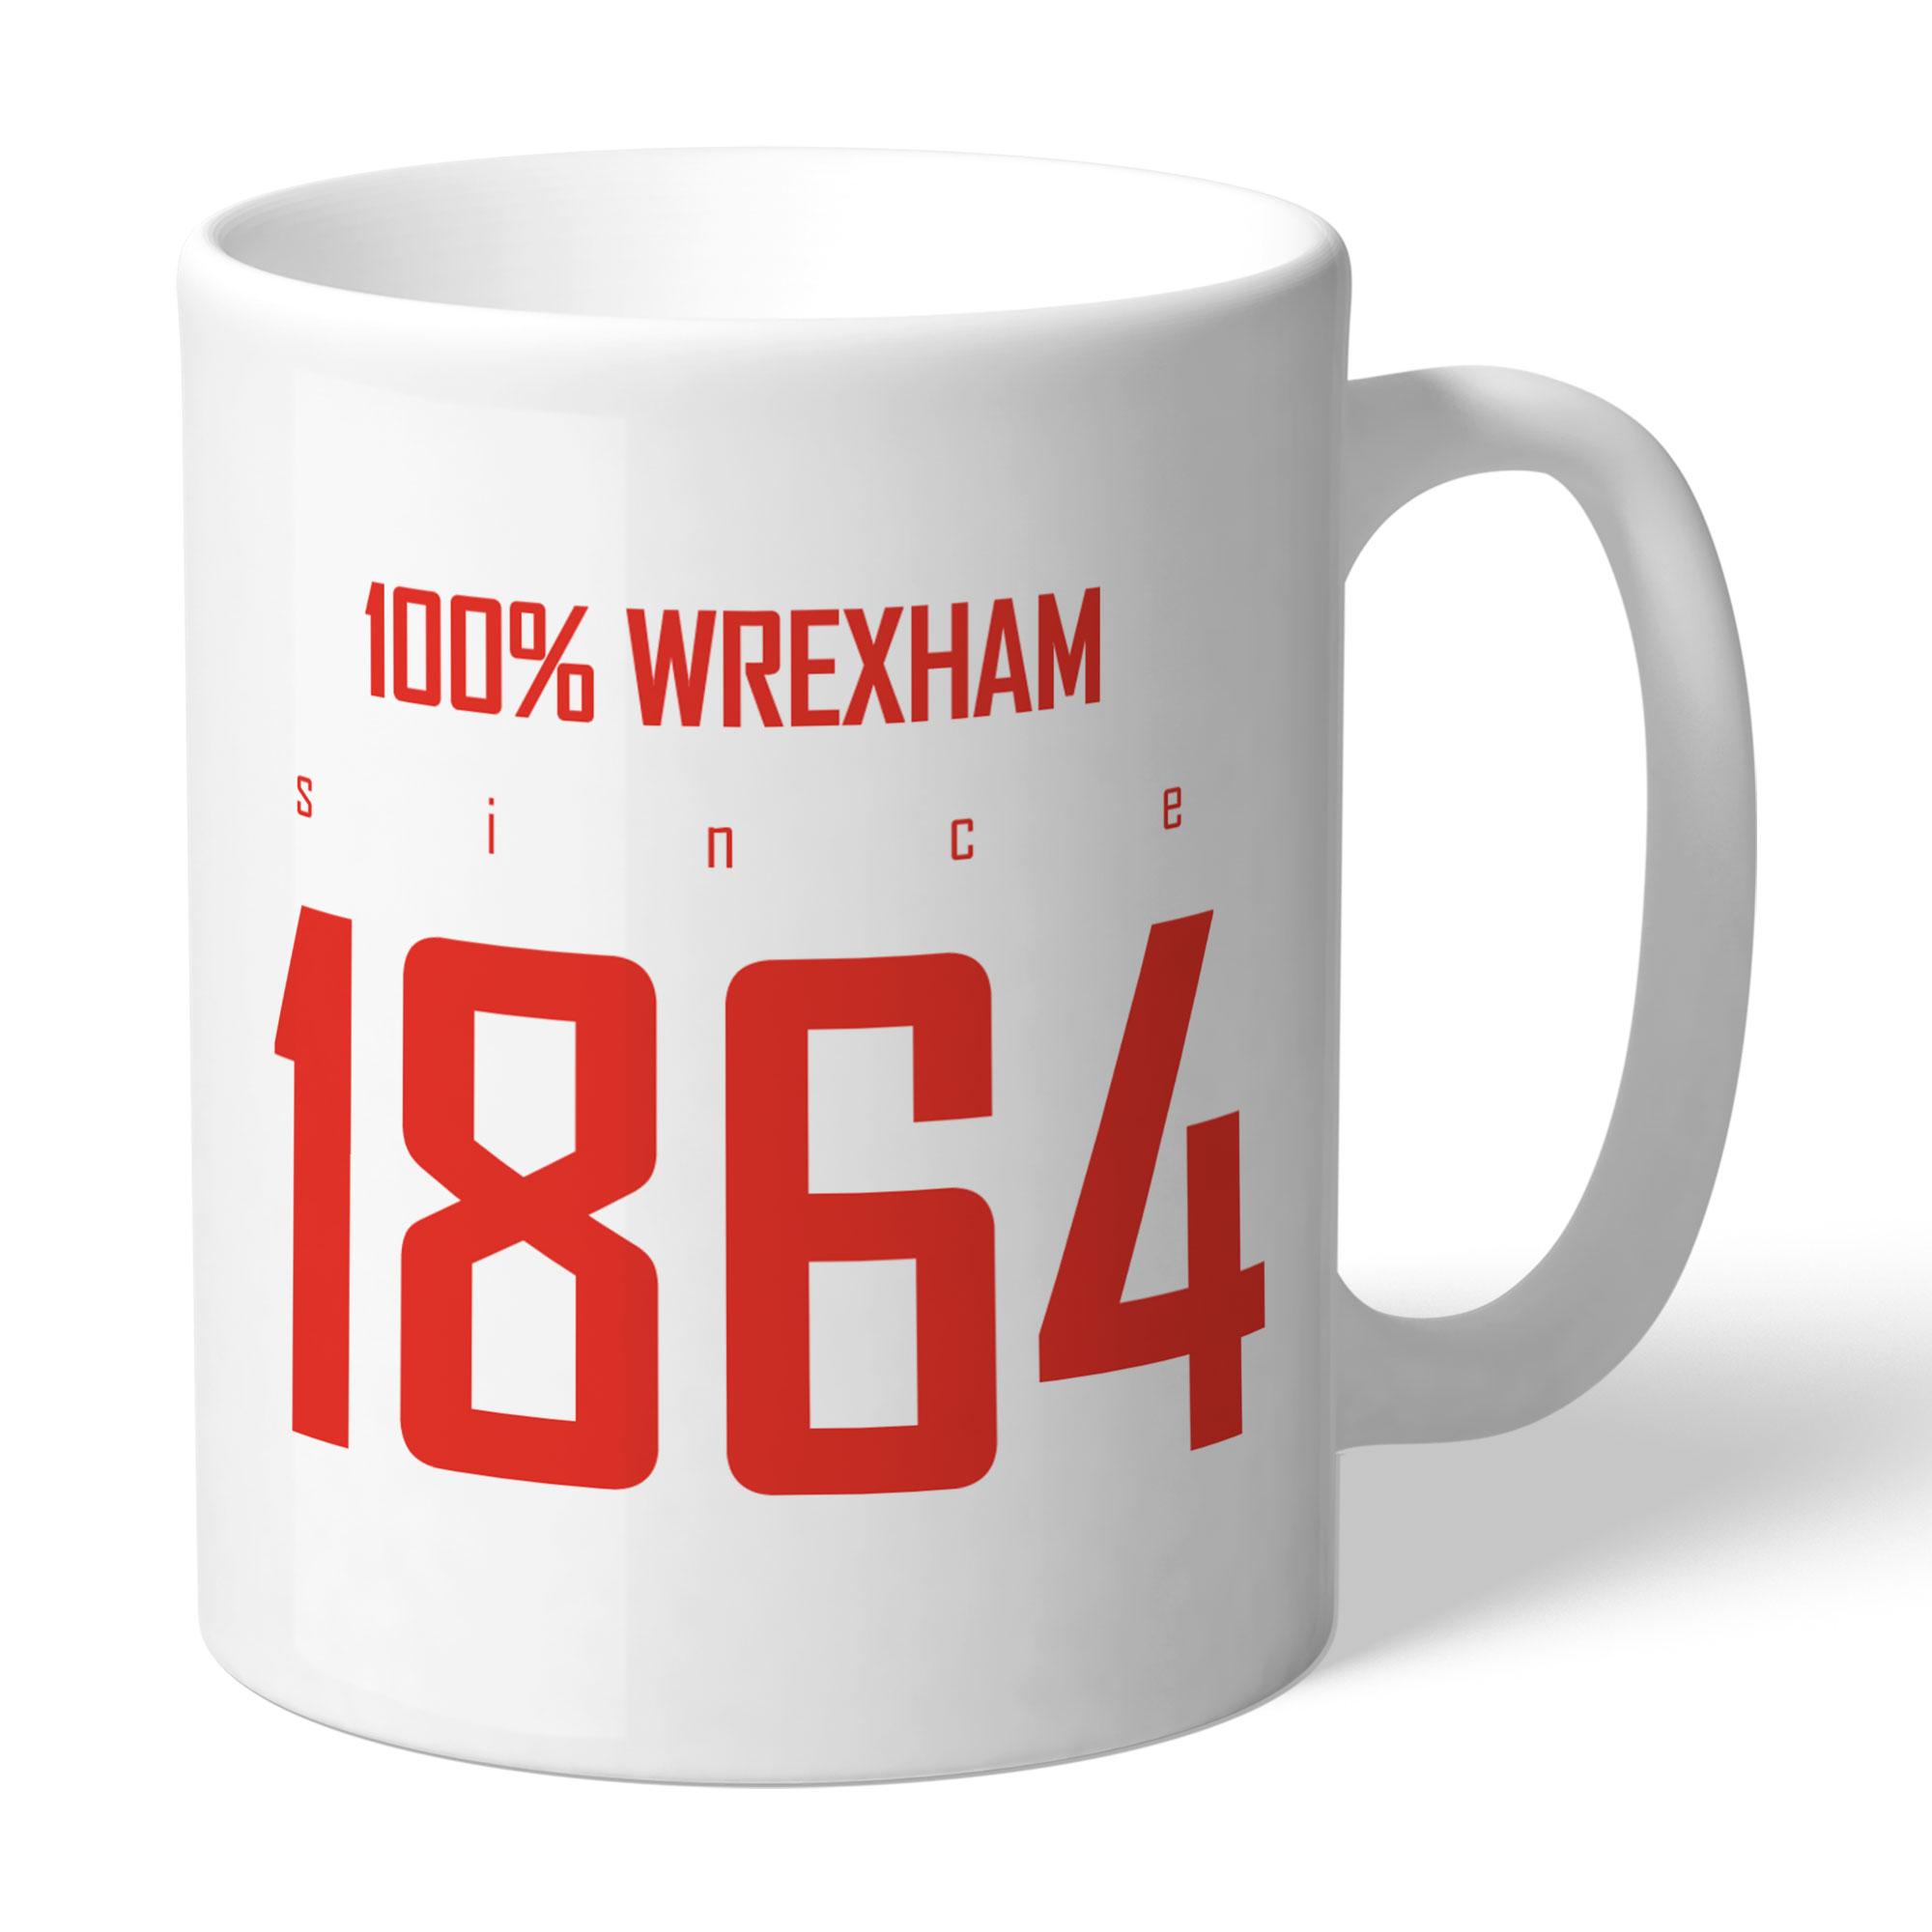 Wrexham AFC 100 Percent Mug